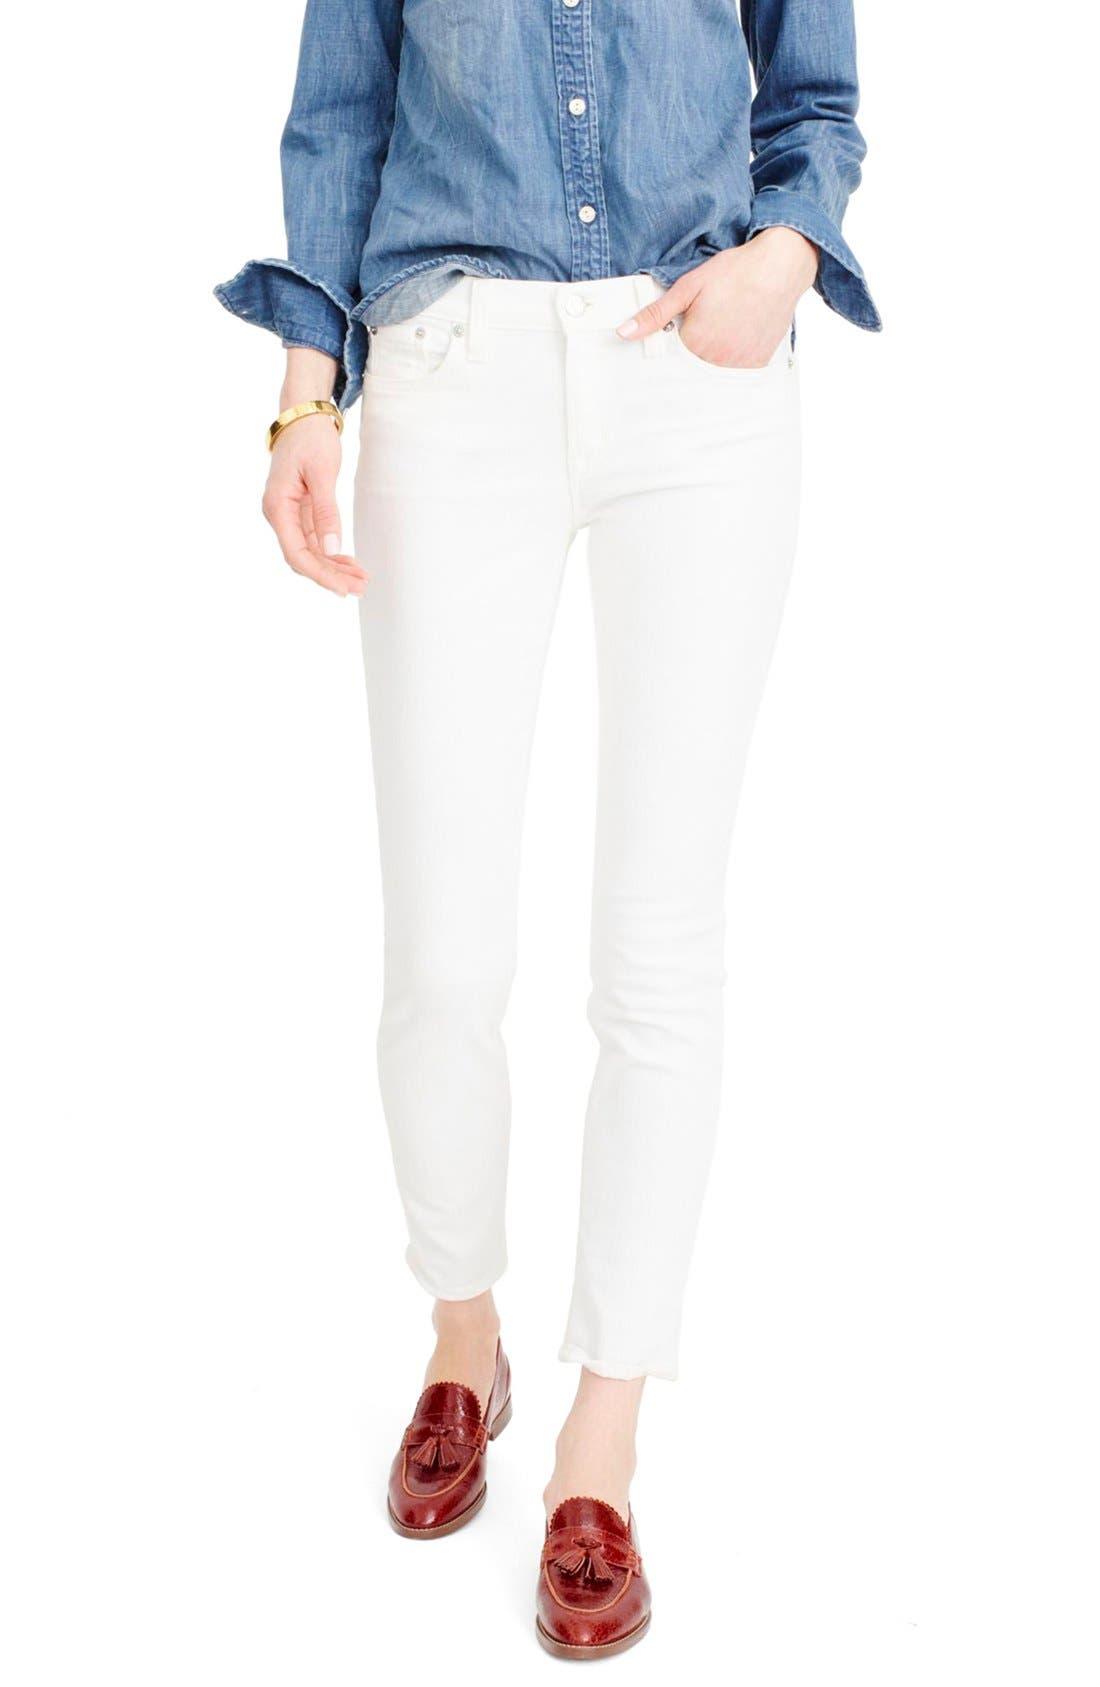 Main Image - J.Crew Toothpick Jeans (Regular & Petite)